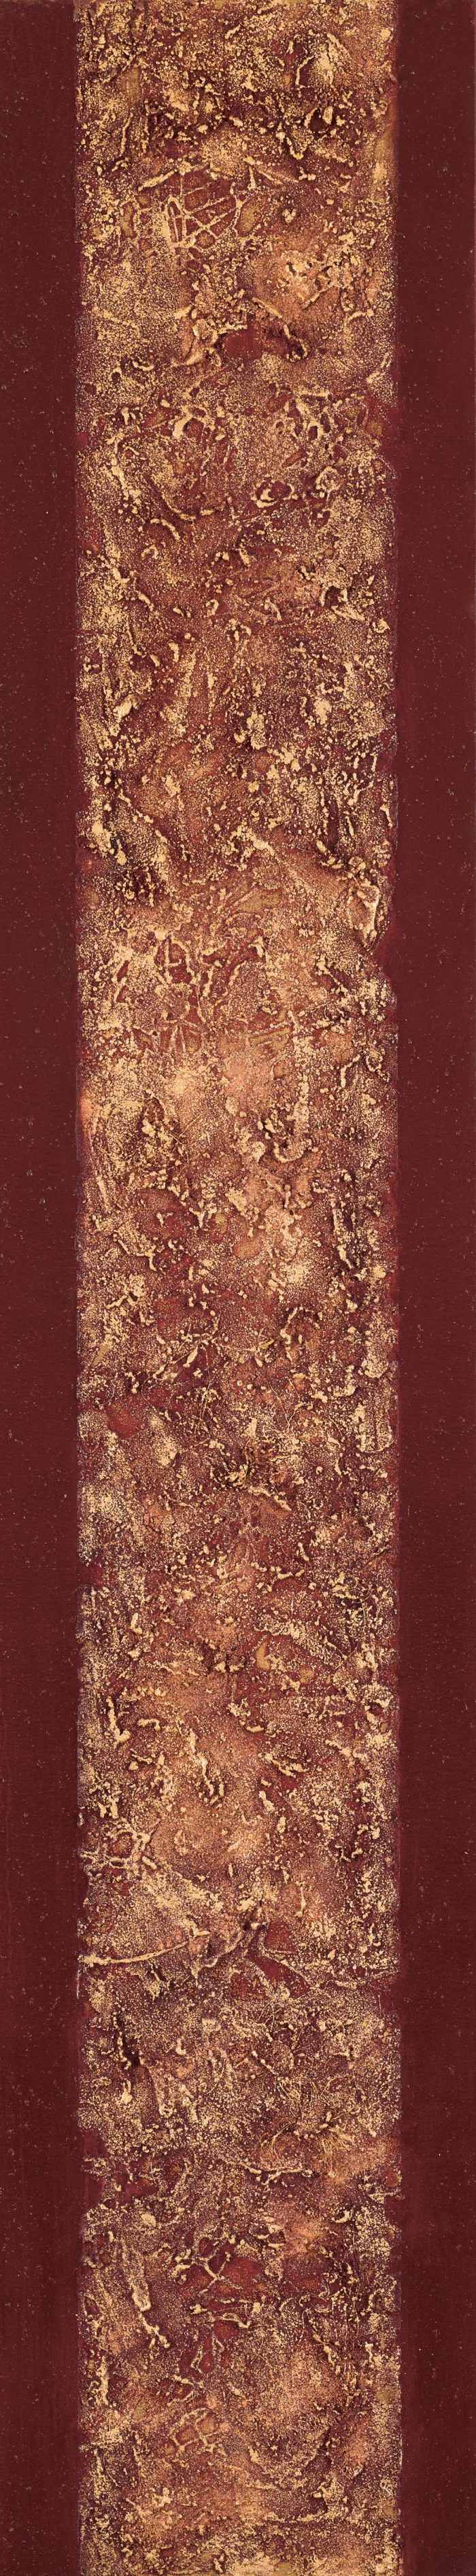 Heart Sutra C (2015) 162cm x 30cm